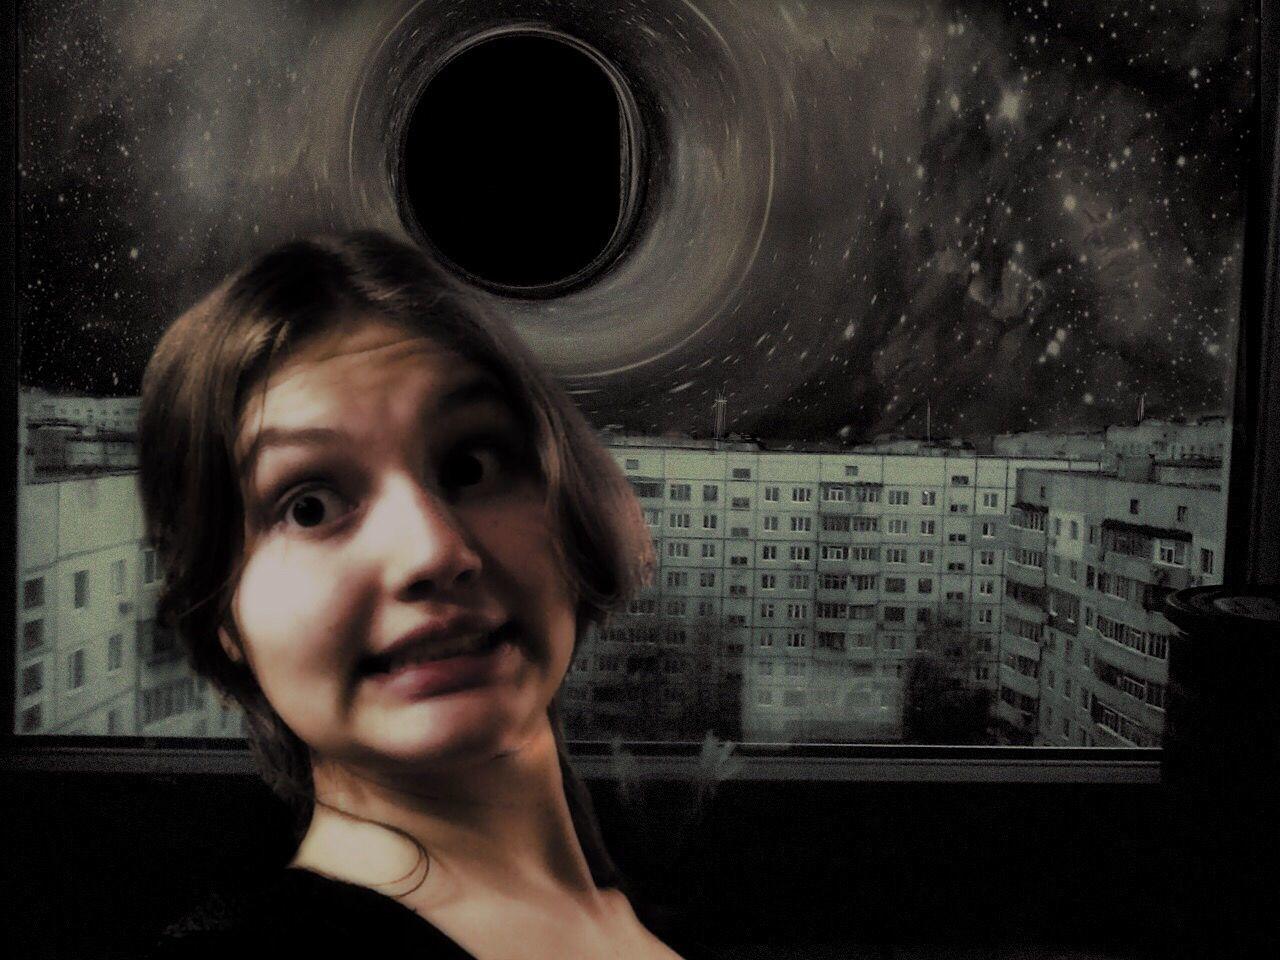 Interstellar Blackhole Apocalypse Makingfun Pixlr